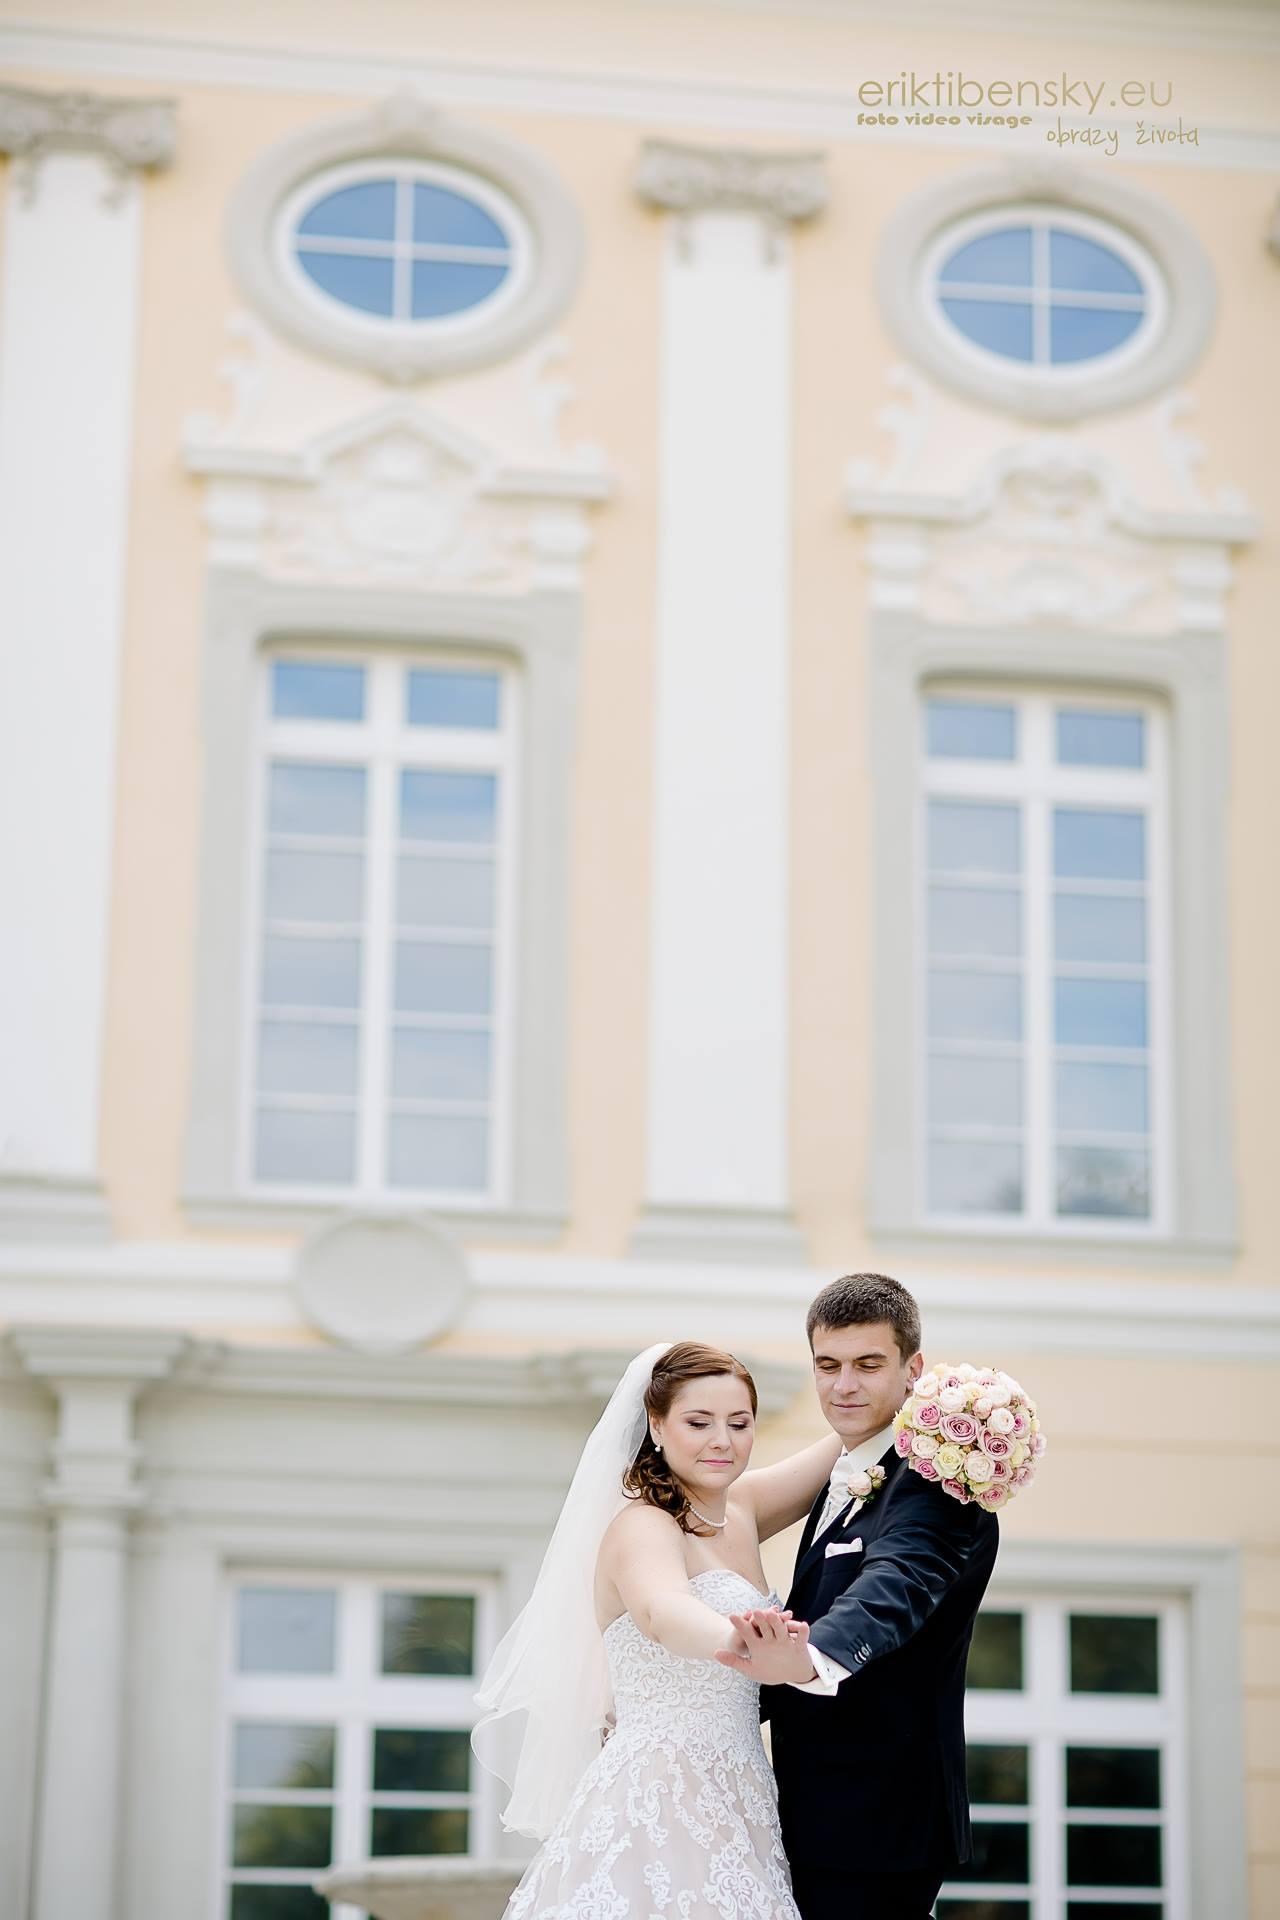 eriktibensky-eu-svadobny-fotograf-wedding-photographer-3073